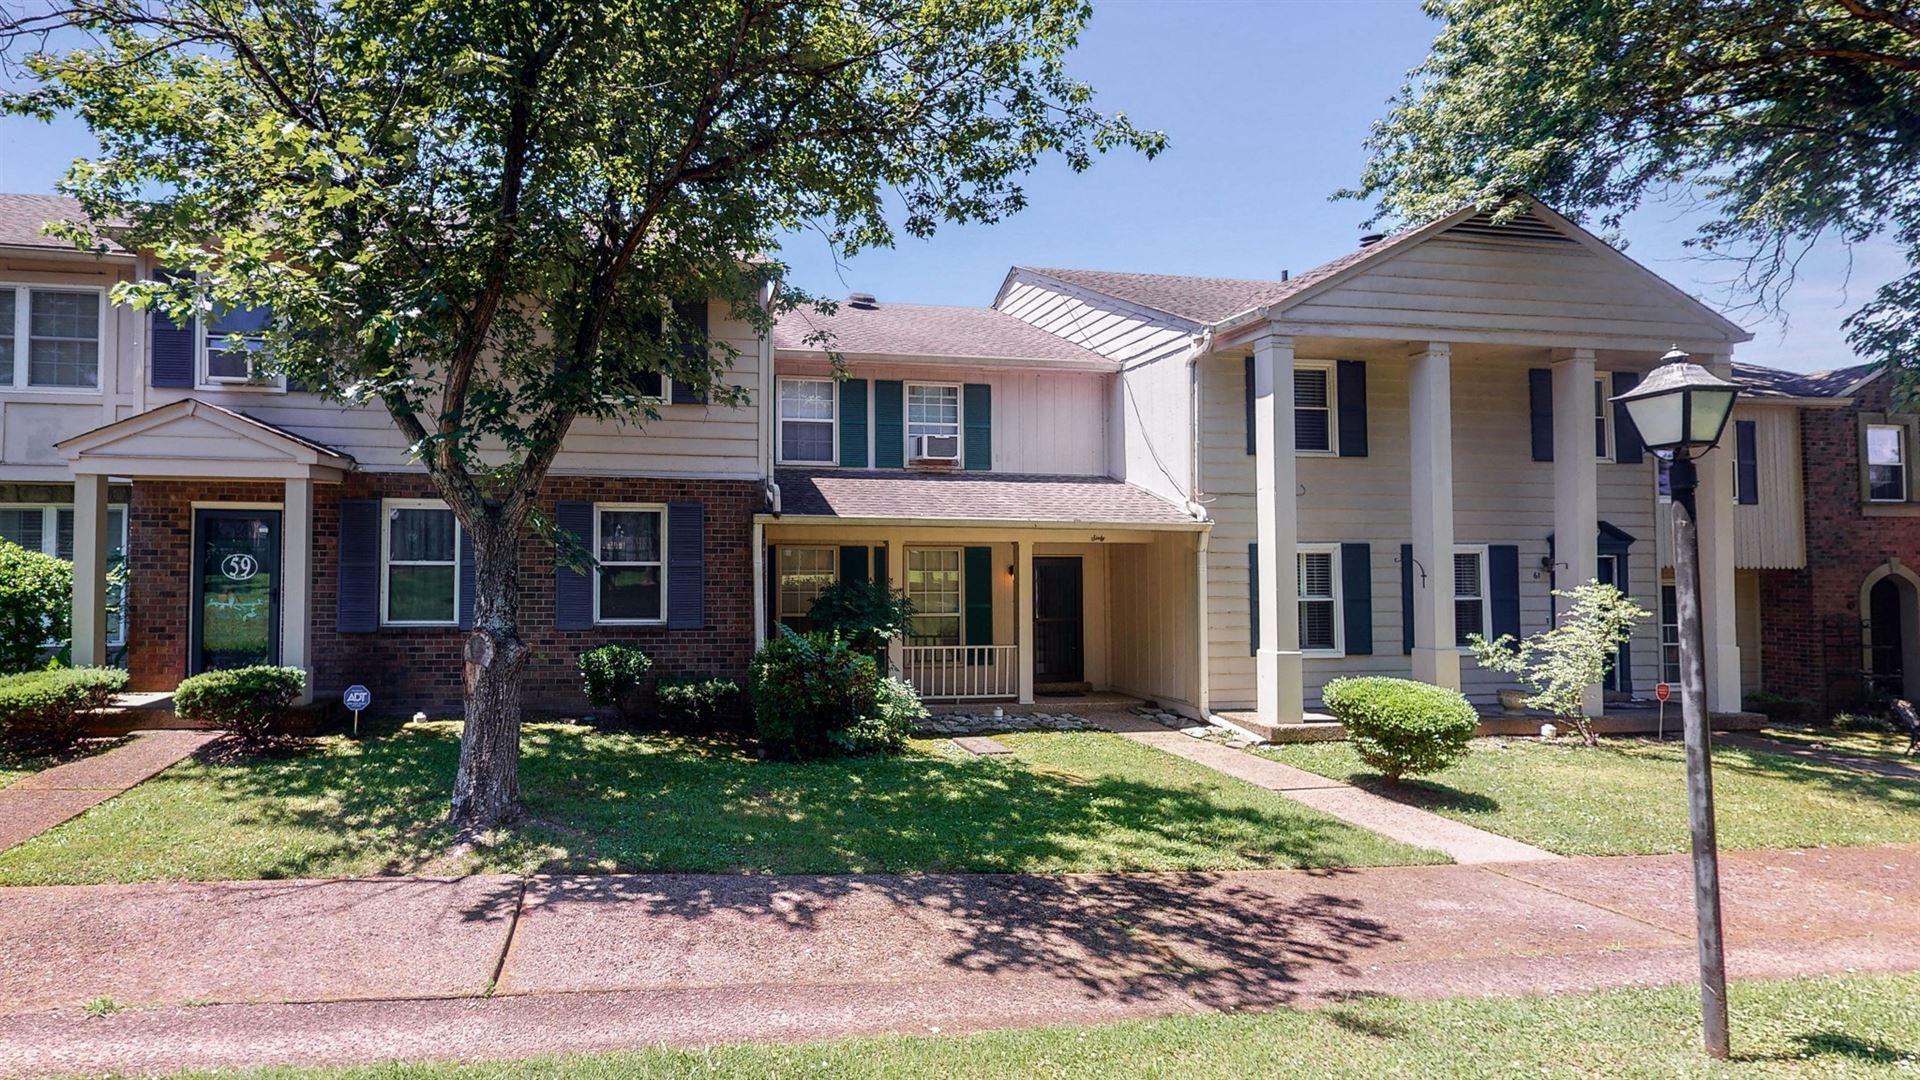 3880 Priest Lake Dr #60, Nashville, TN 37217 - MLS#: 2264076